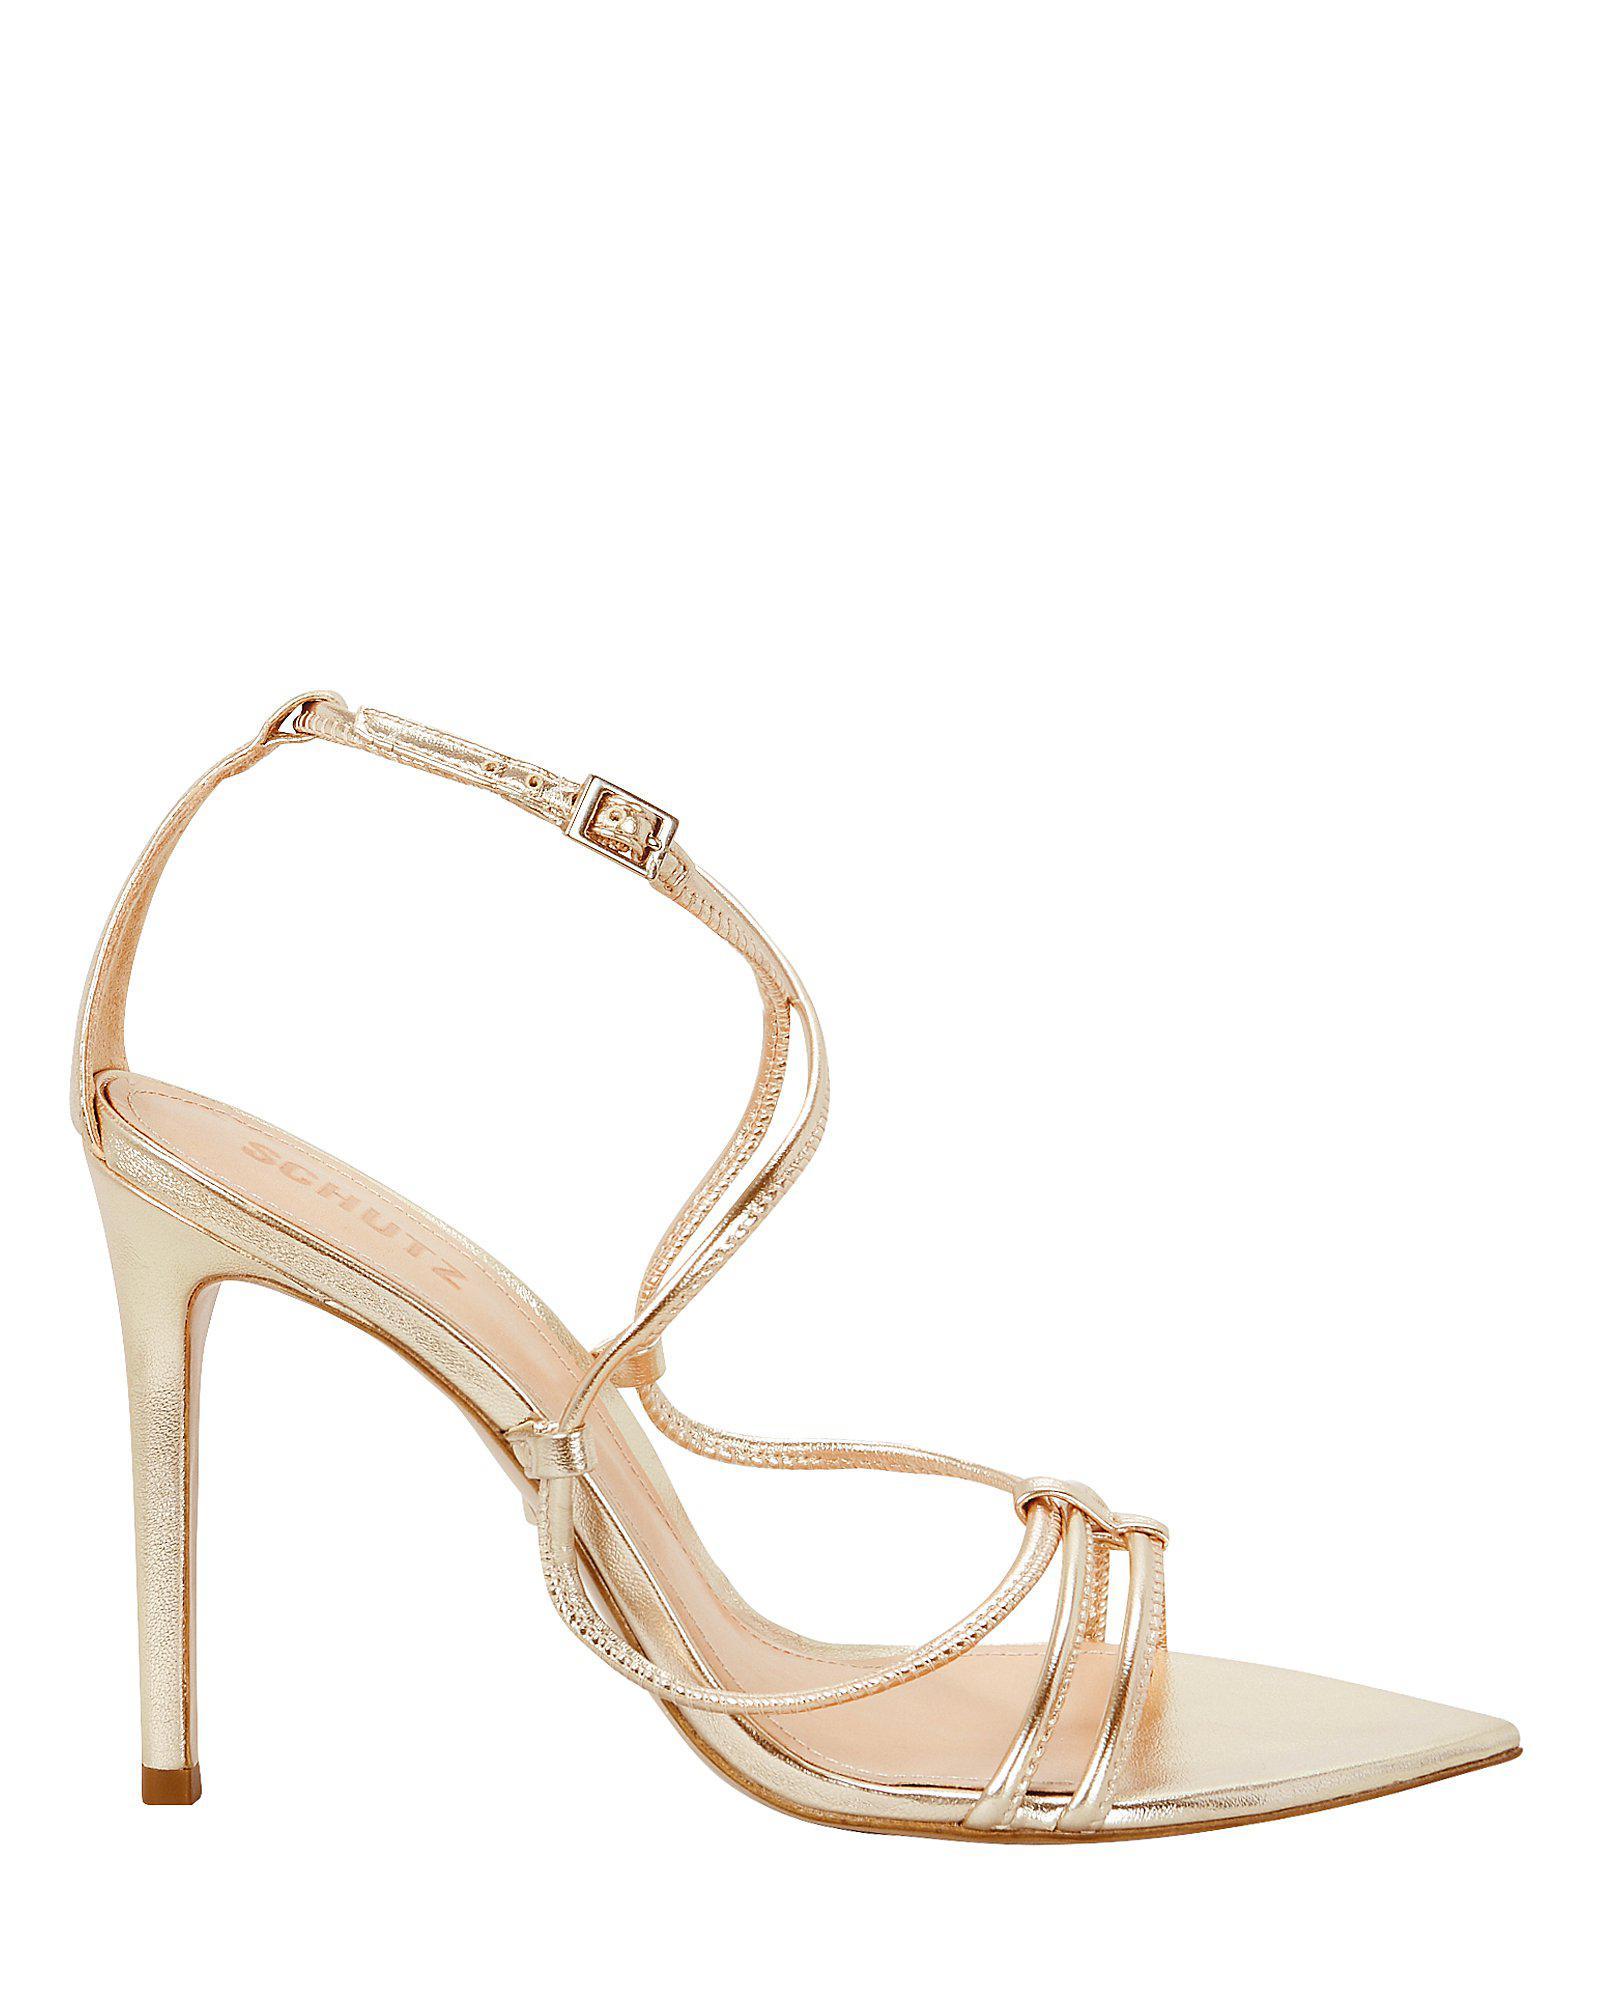 336f04d6269 Schutz - Metallic Evellyn Strappy Gold Leather Sandals - Lyst. View  fullscreen